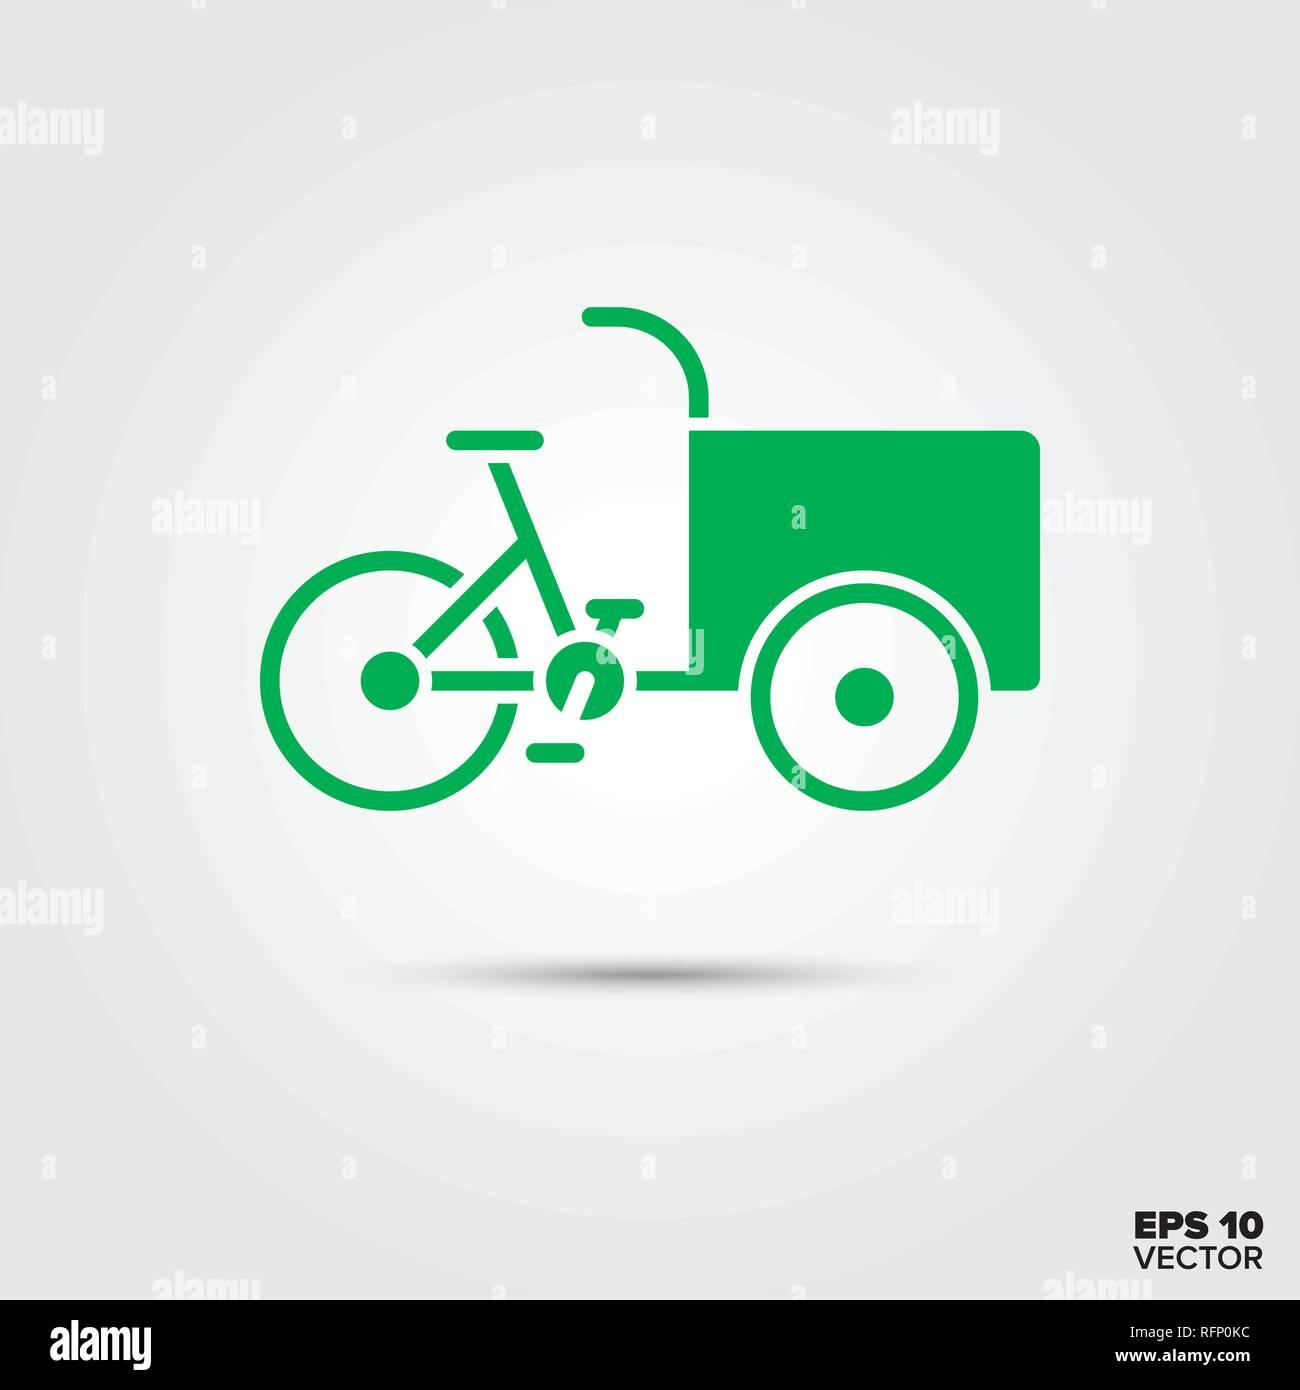 Cargobike icon, Sustainable delivery vehicle, eco-friendly transportation symbol. EPS 10 Vector. - Stock Image